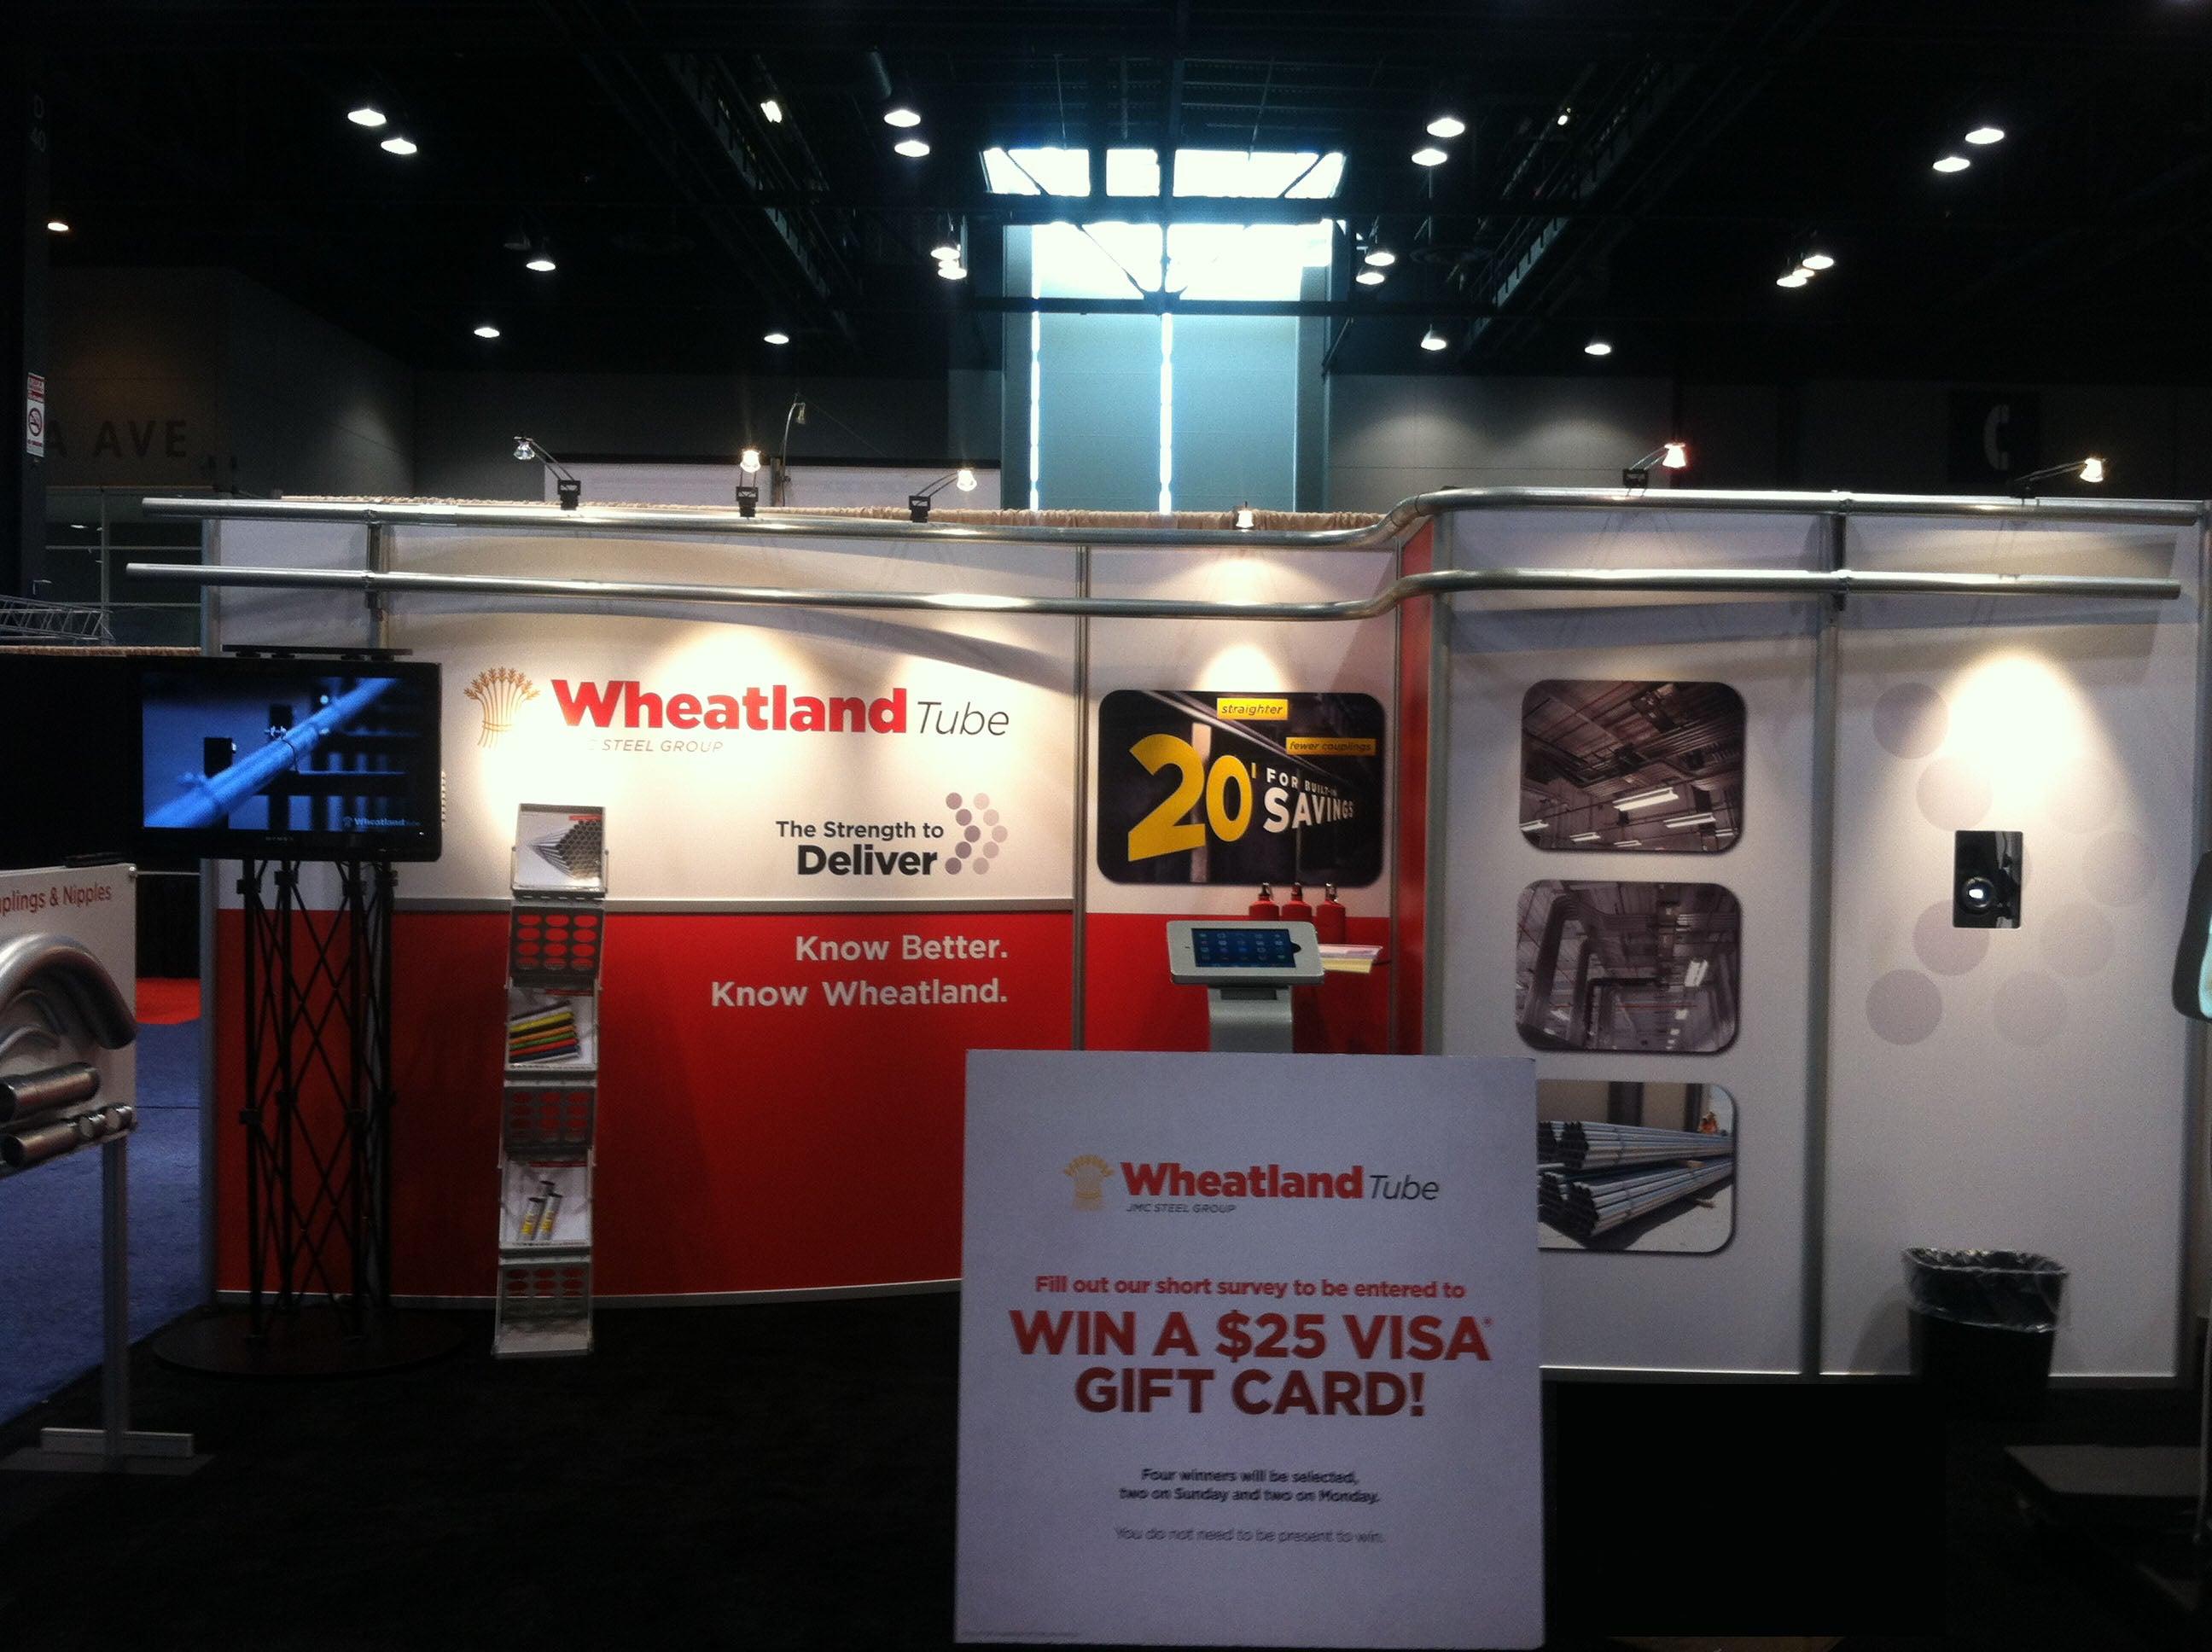 Wheatland Tube Trade Show Booth Main